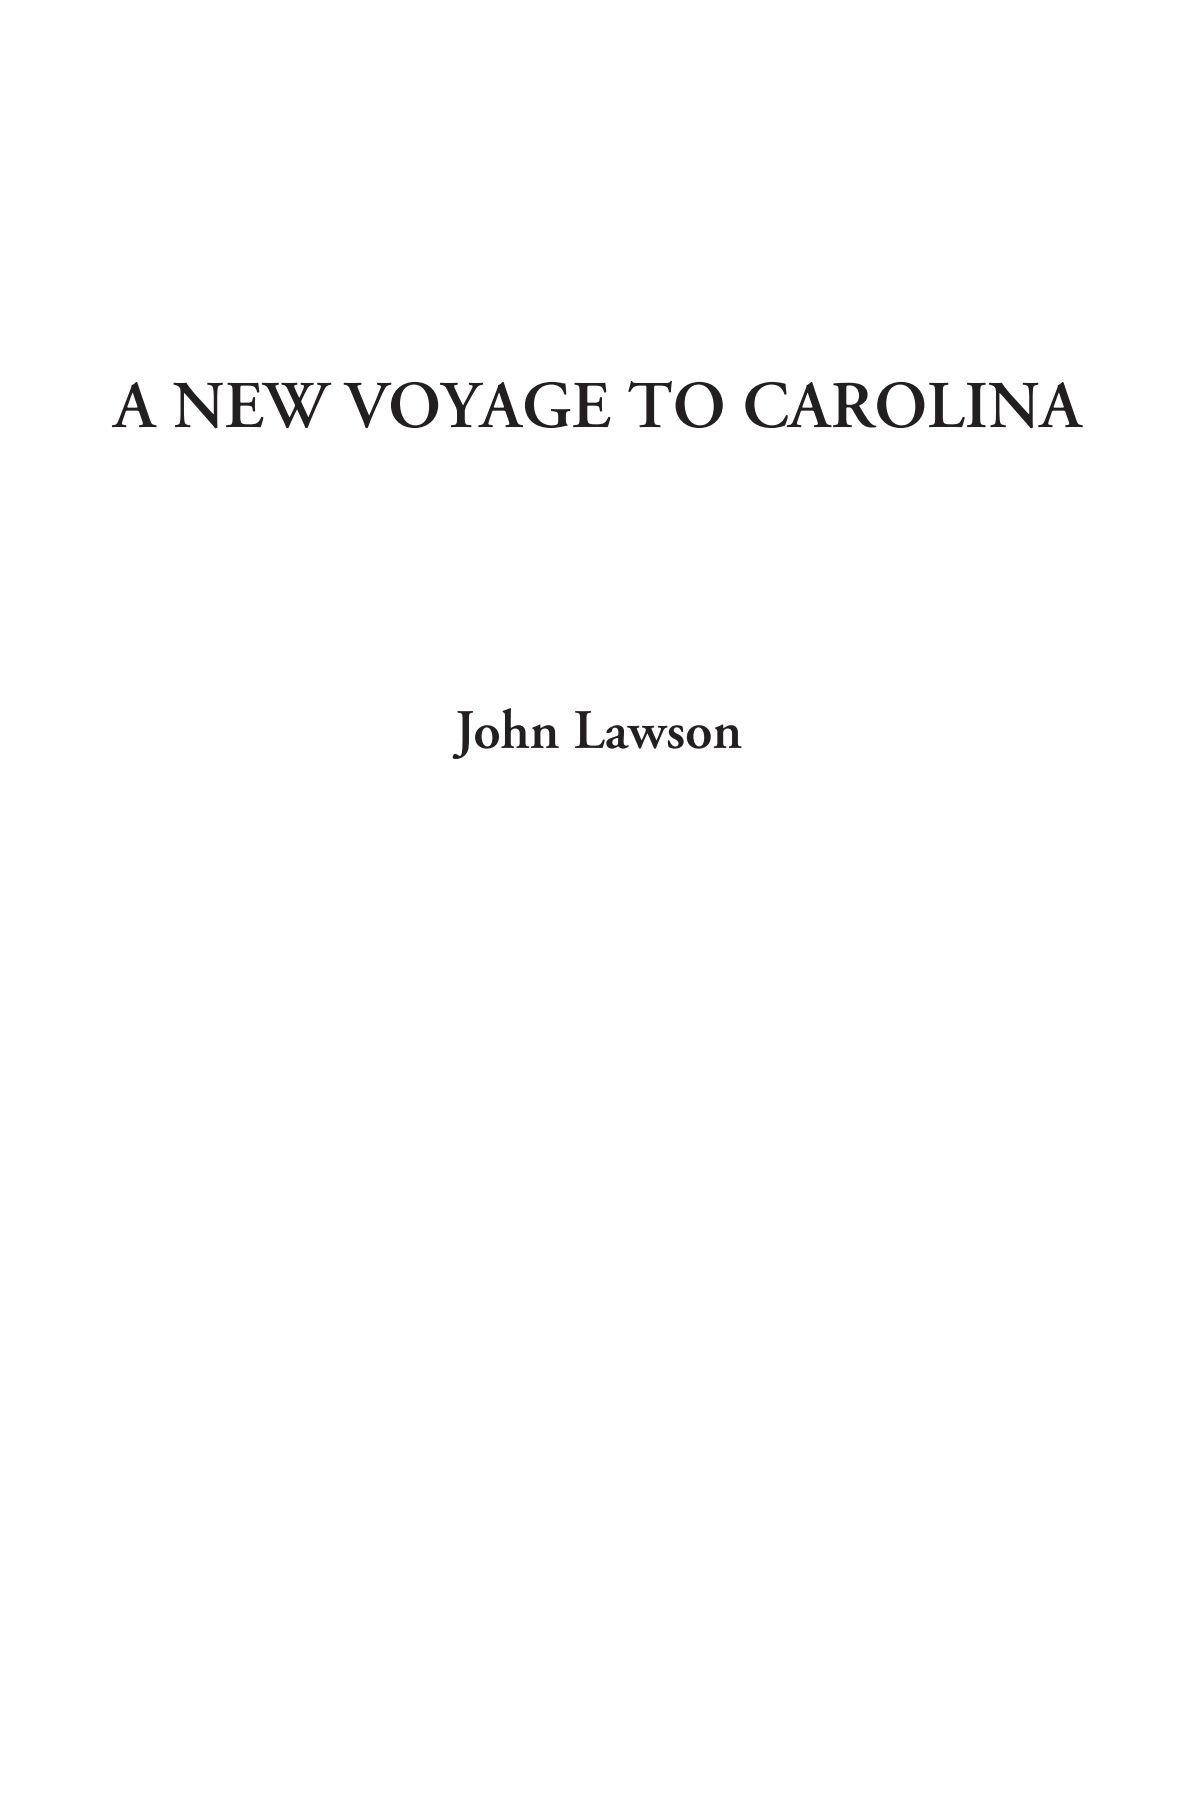 Download A New Voyage to Carolina ebook